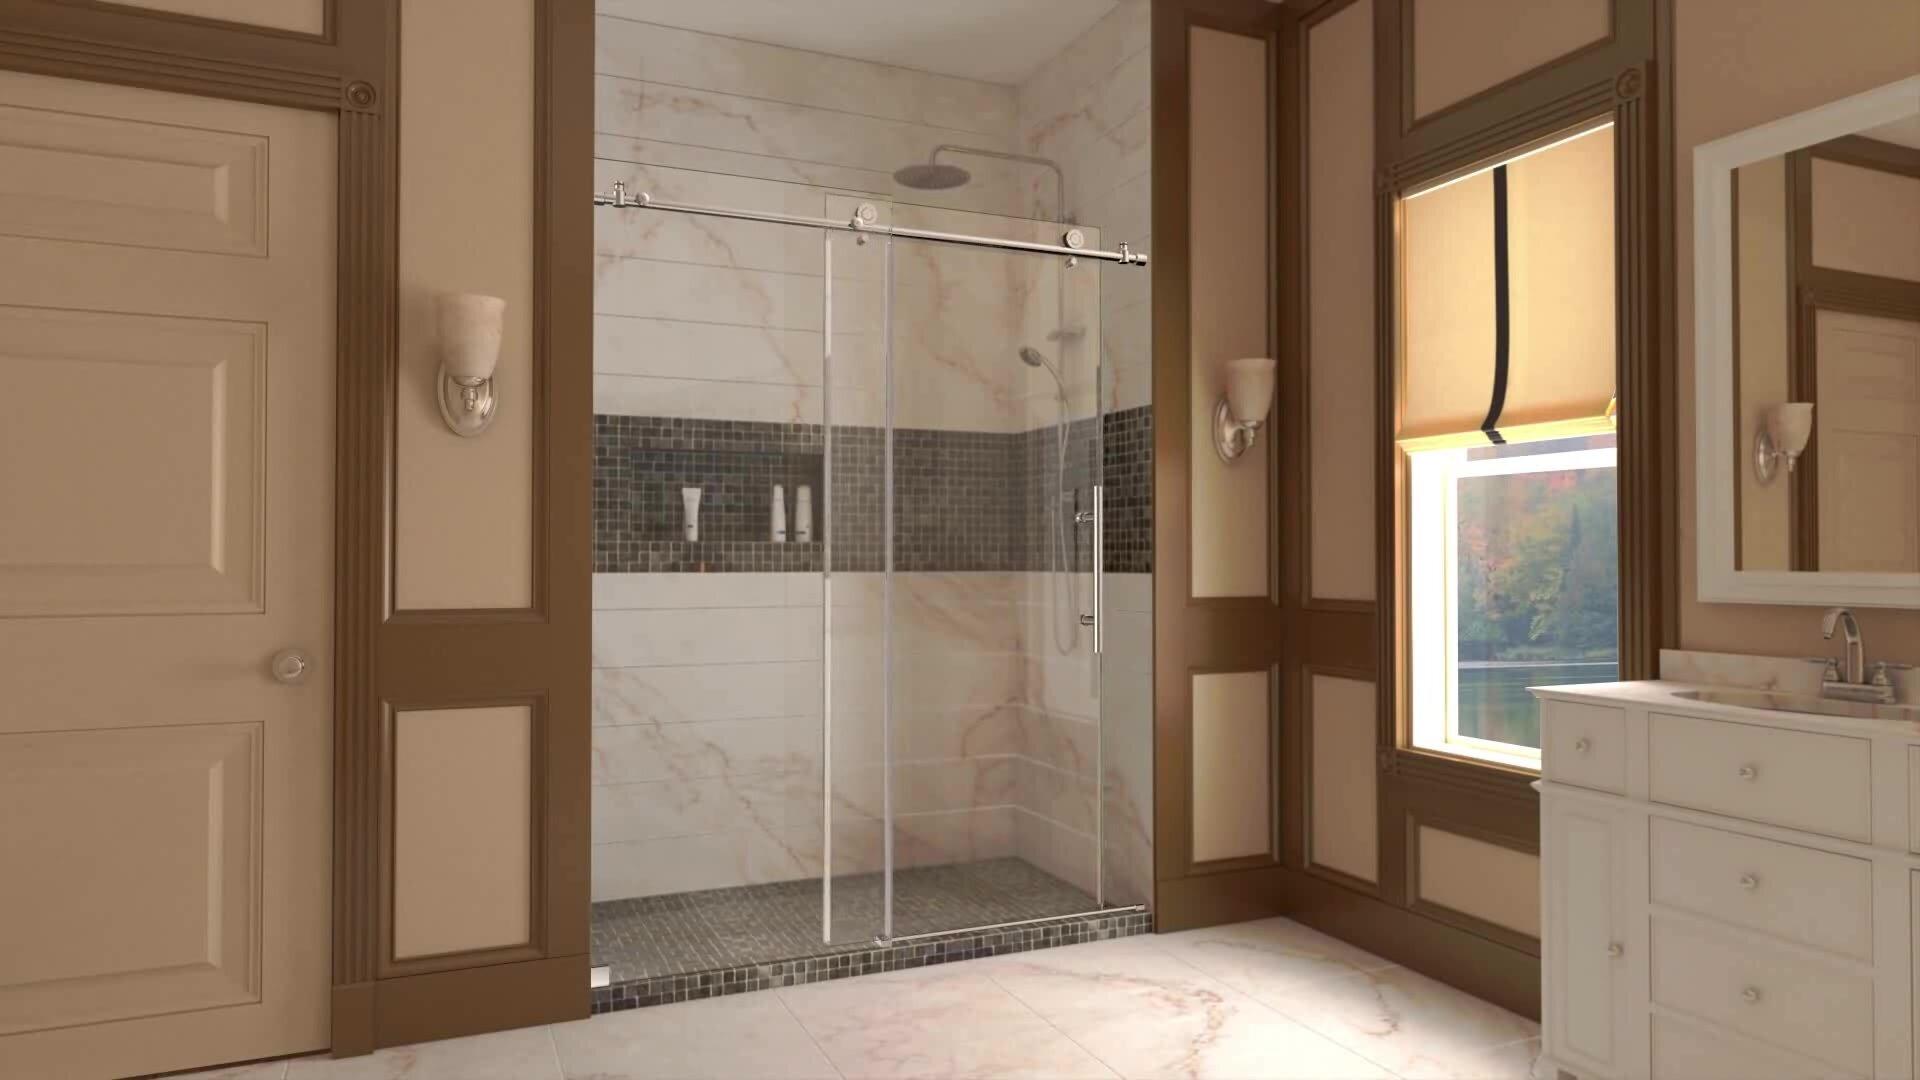 Lesscare clear glass shower door ultra b 44 48 wide x 76 high chrome - Dreamline Enigma X 60 X 76 Single Sliding Fully Frameless Shower Door Reviews Wayfair